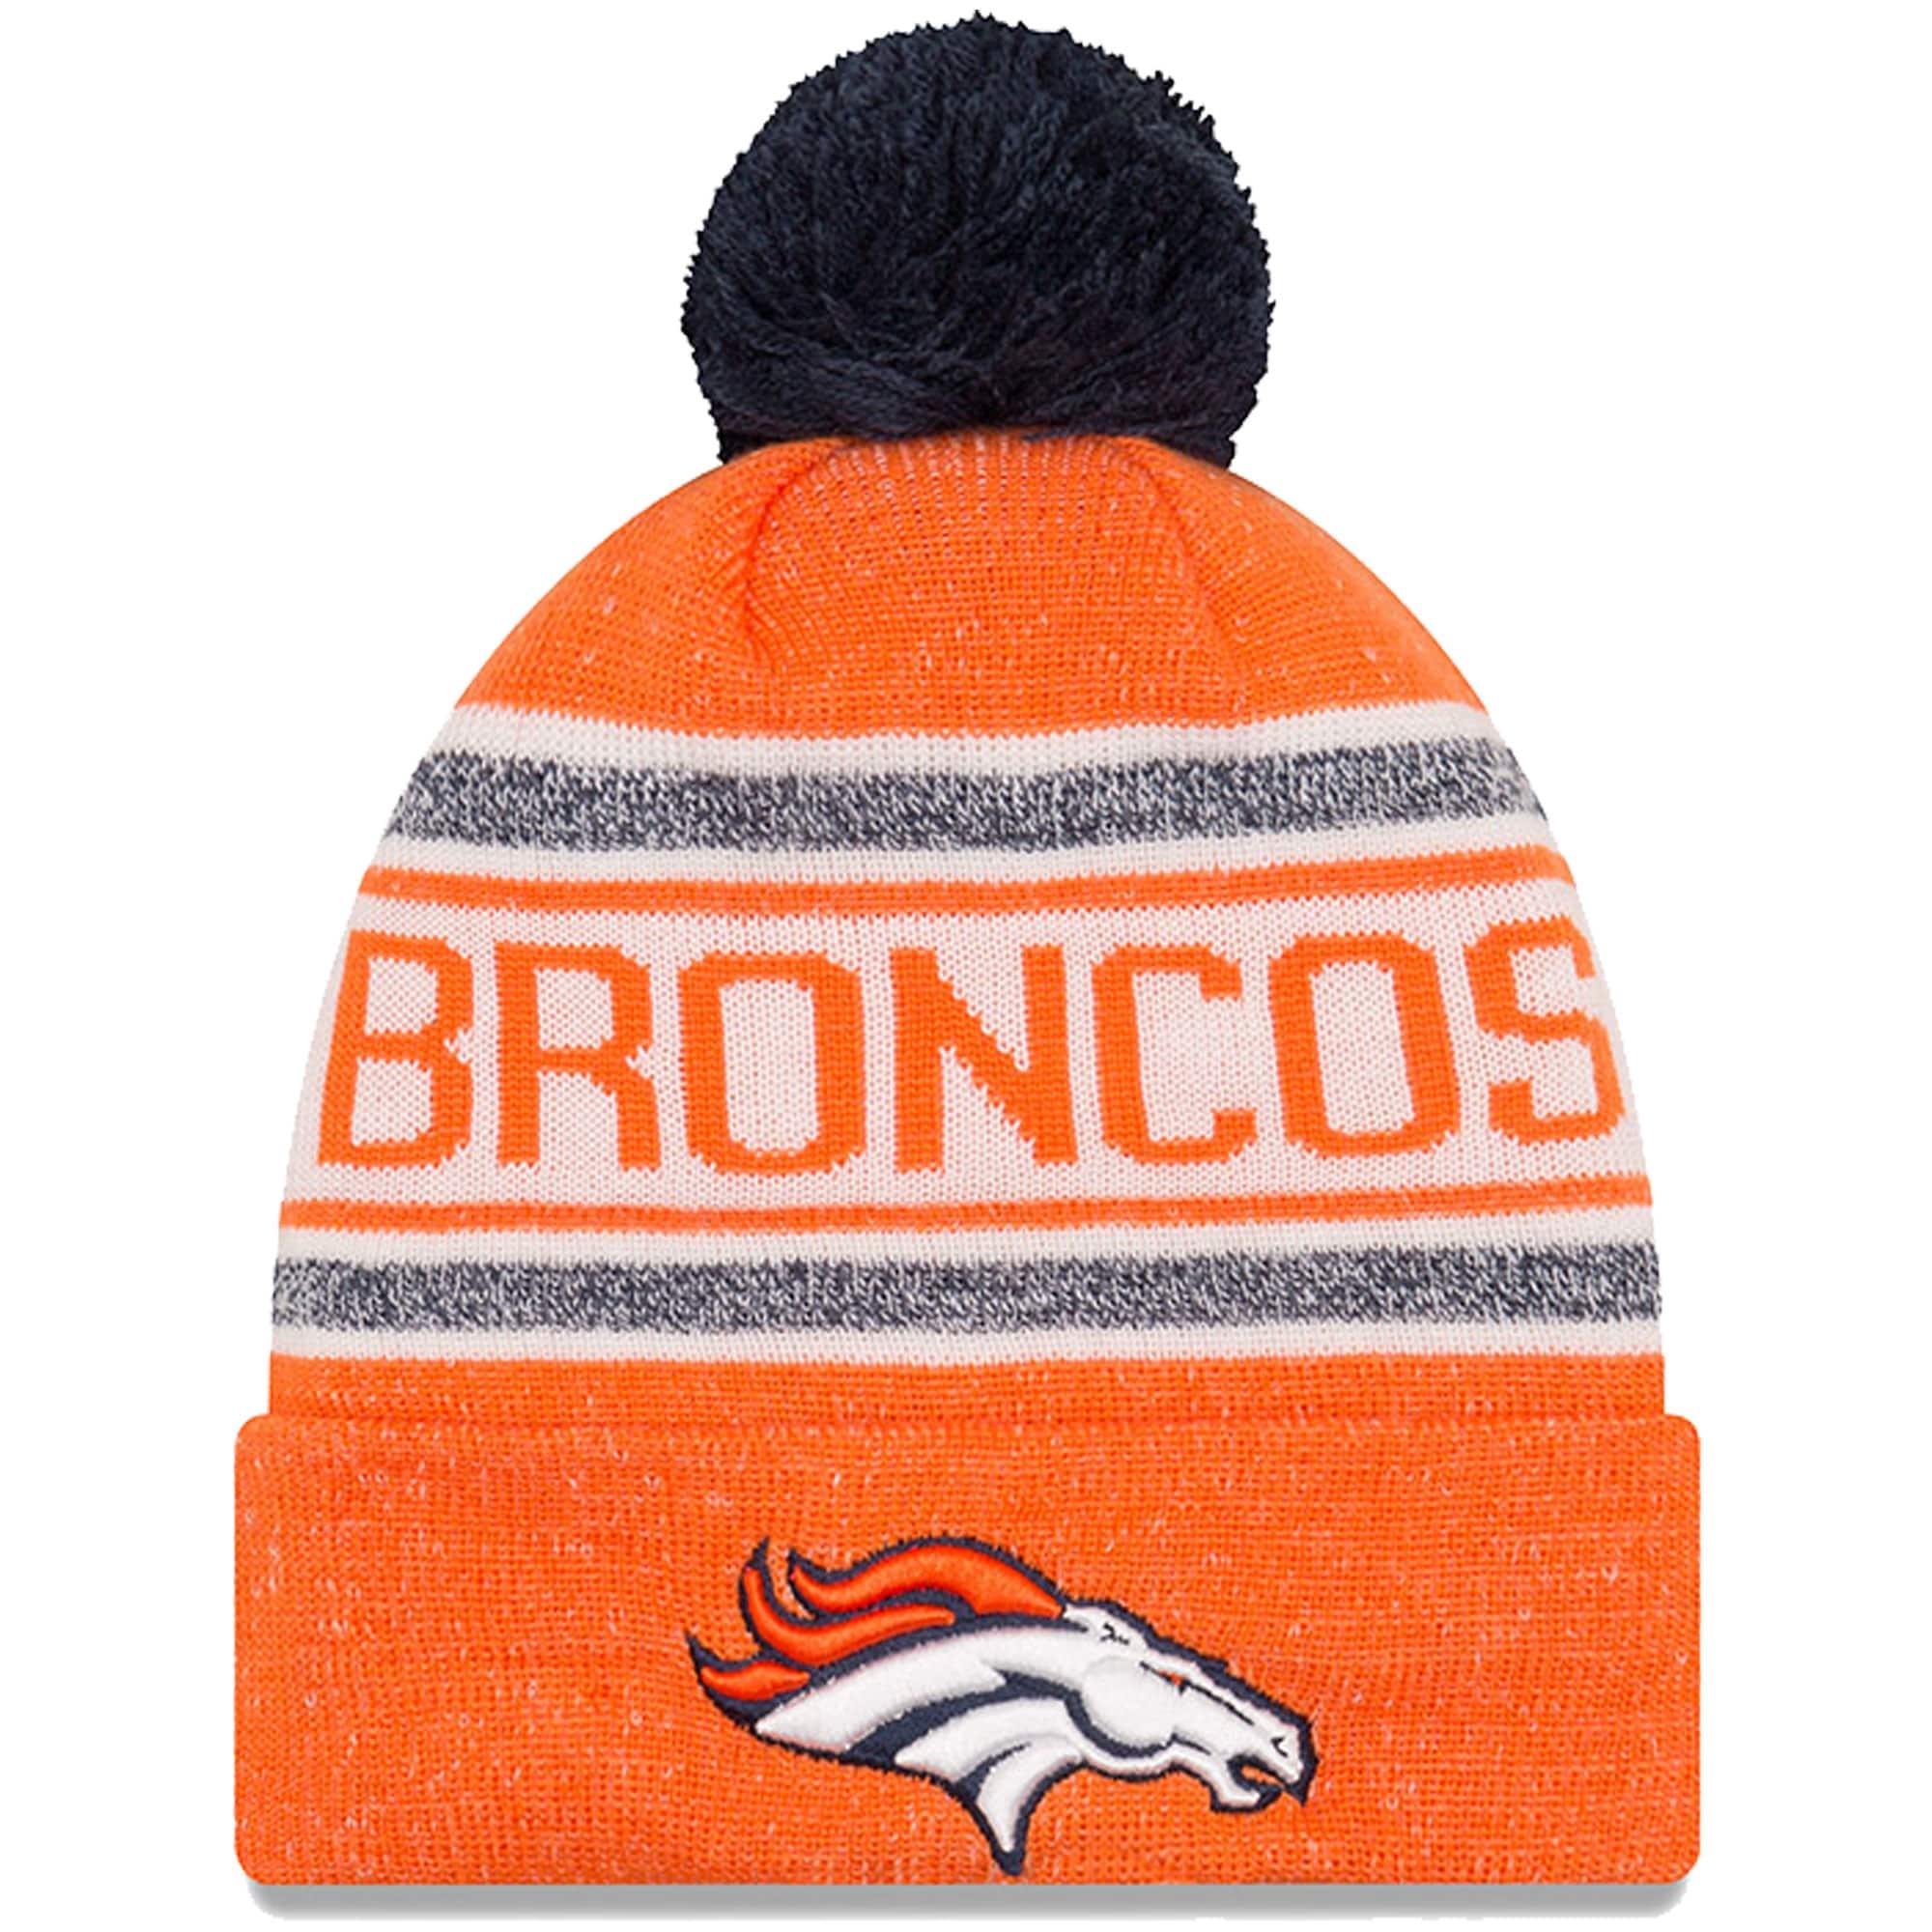 Denver Broncos New Era Toasty Cover Cuffed Knit Hat with Pom - Orange